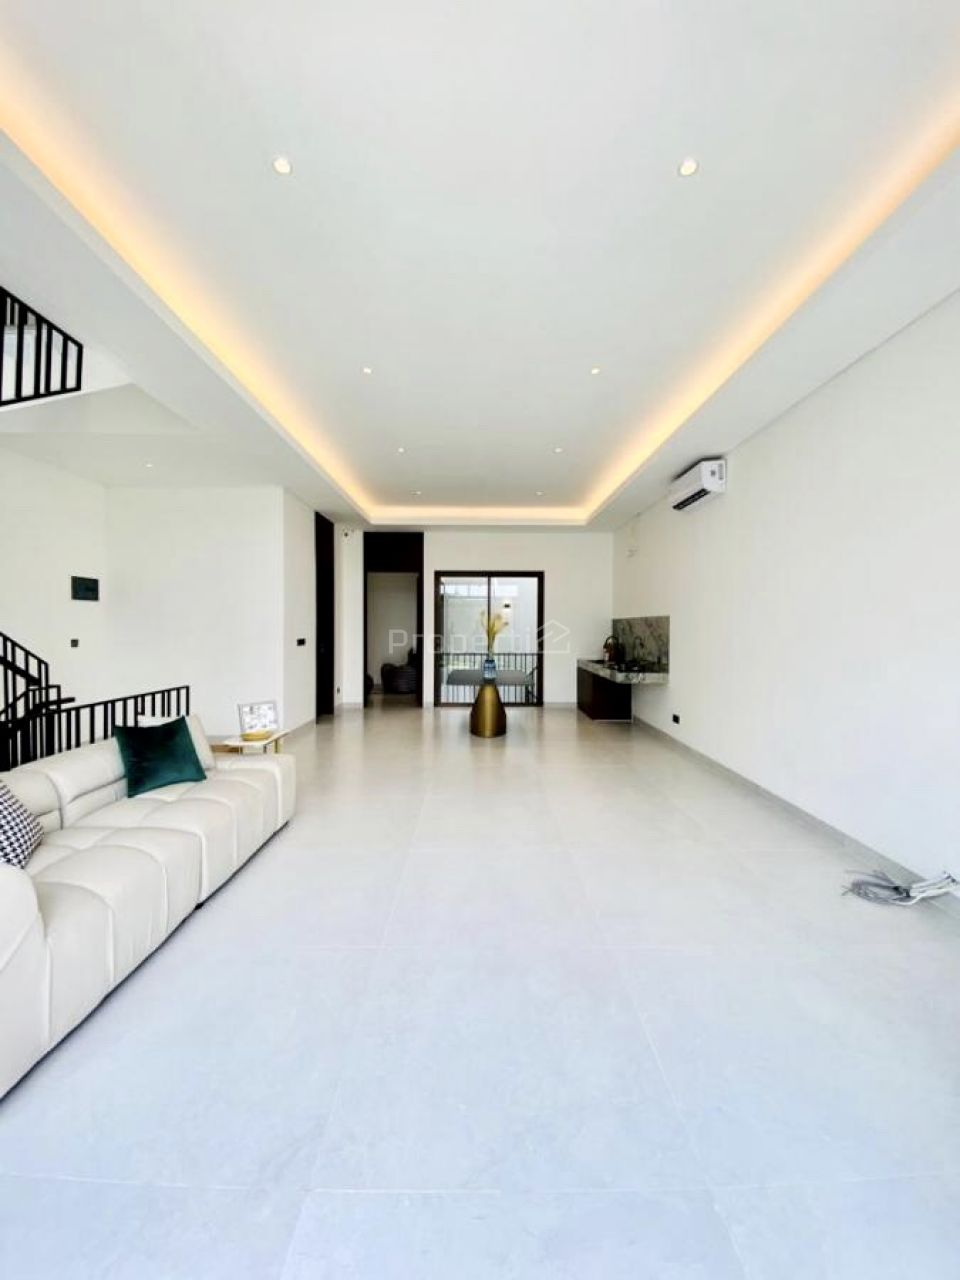 Rumah Townhouse Baru di Kemang, Jakarta Selatan, Mampang Prapatan